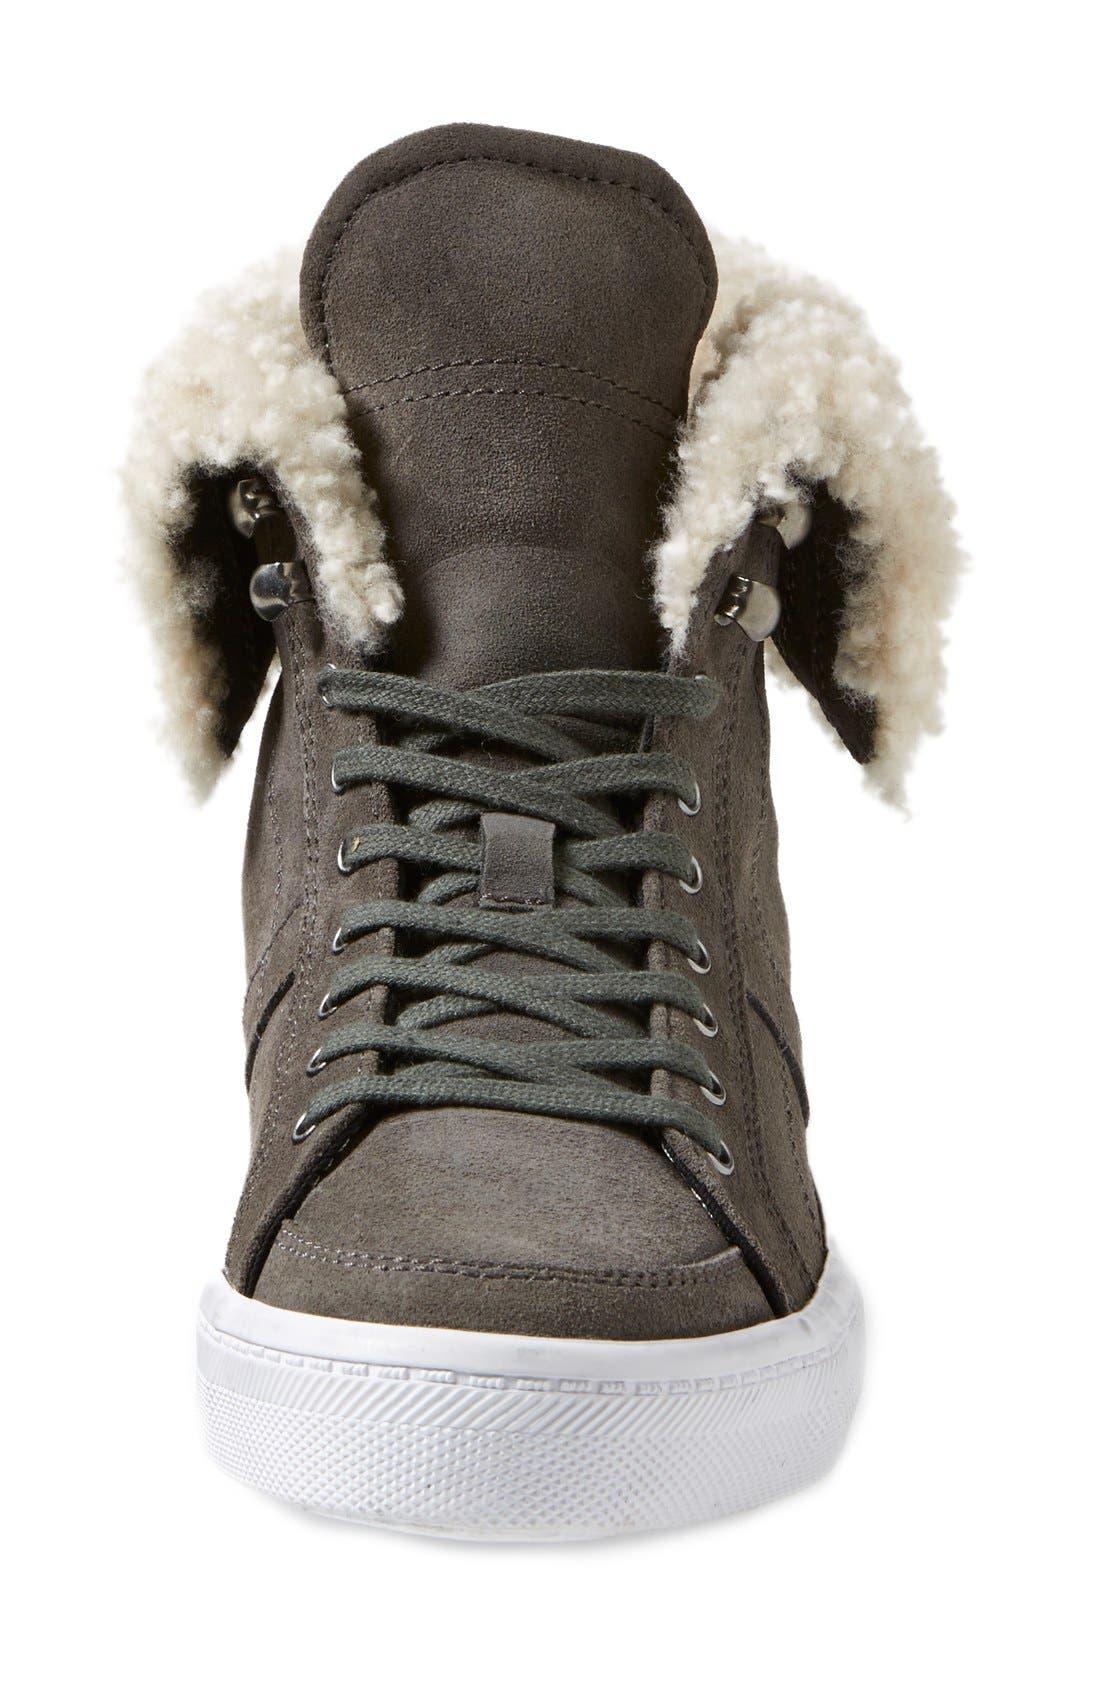 REBECCA MINKOFF,                             'Sasha' Suede High Top Sneaker,                             Alternate thumbnail 2, color,                             020